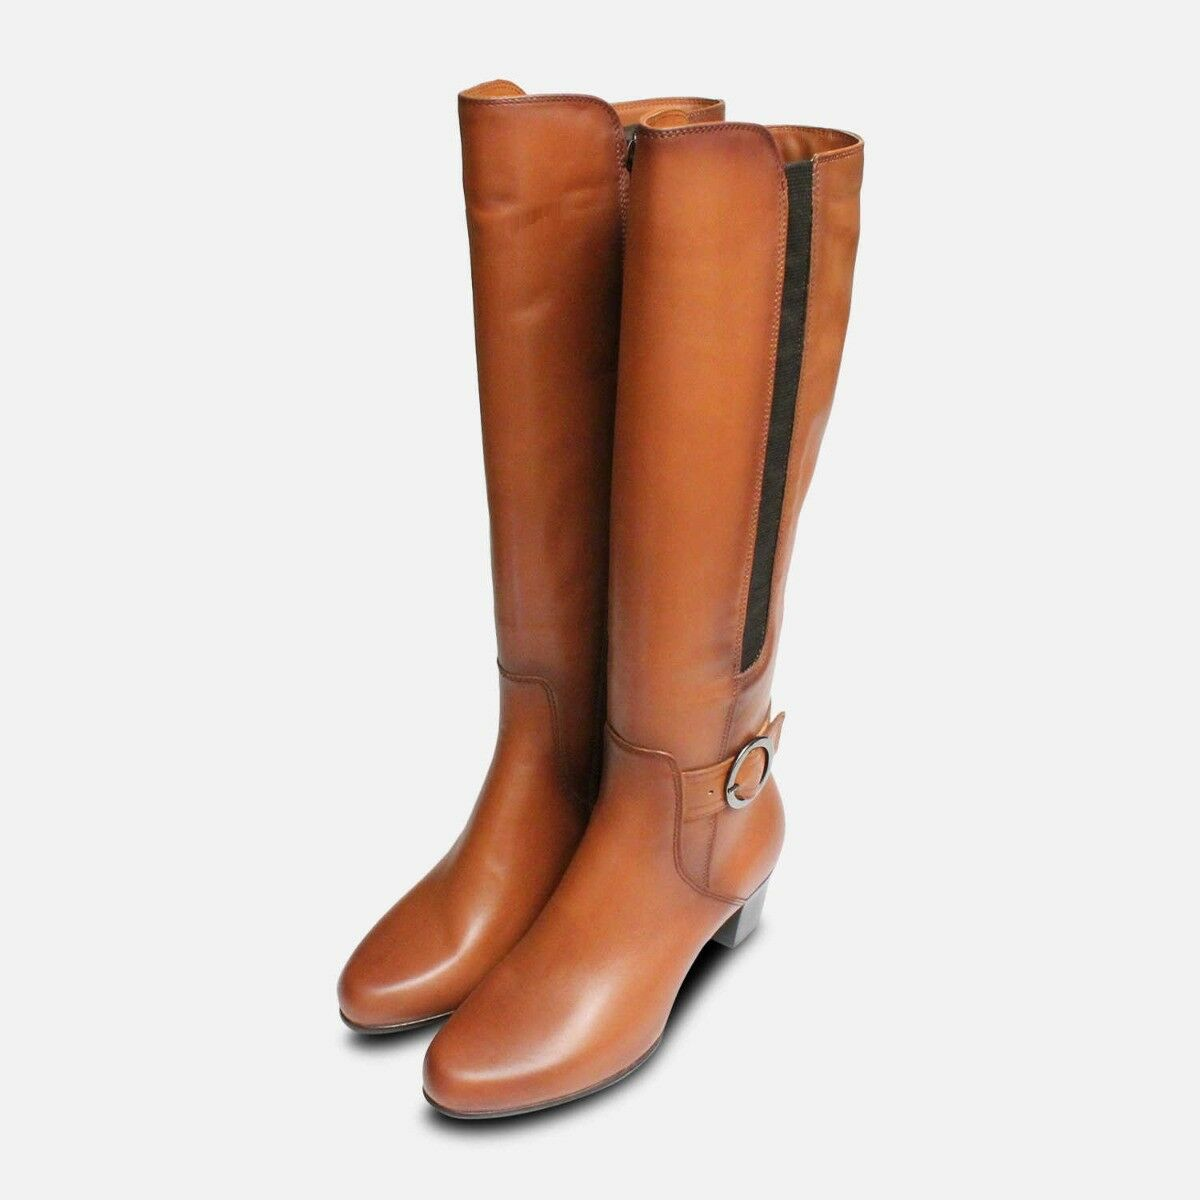 Tamaris Tan braun Leather Knee High Stiefel with Heel